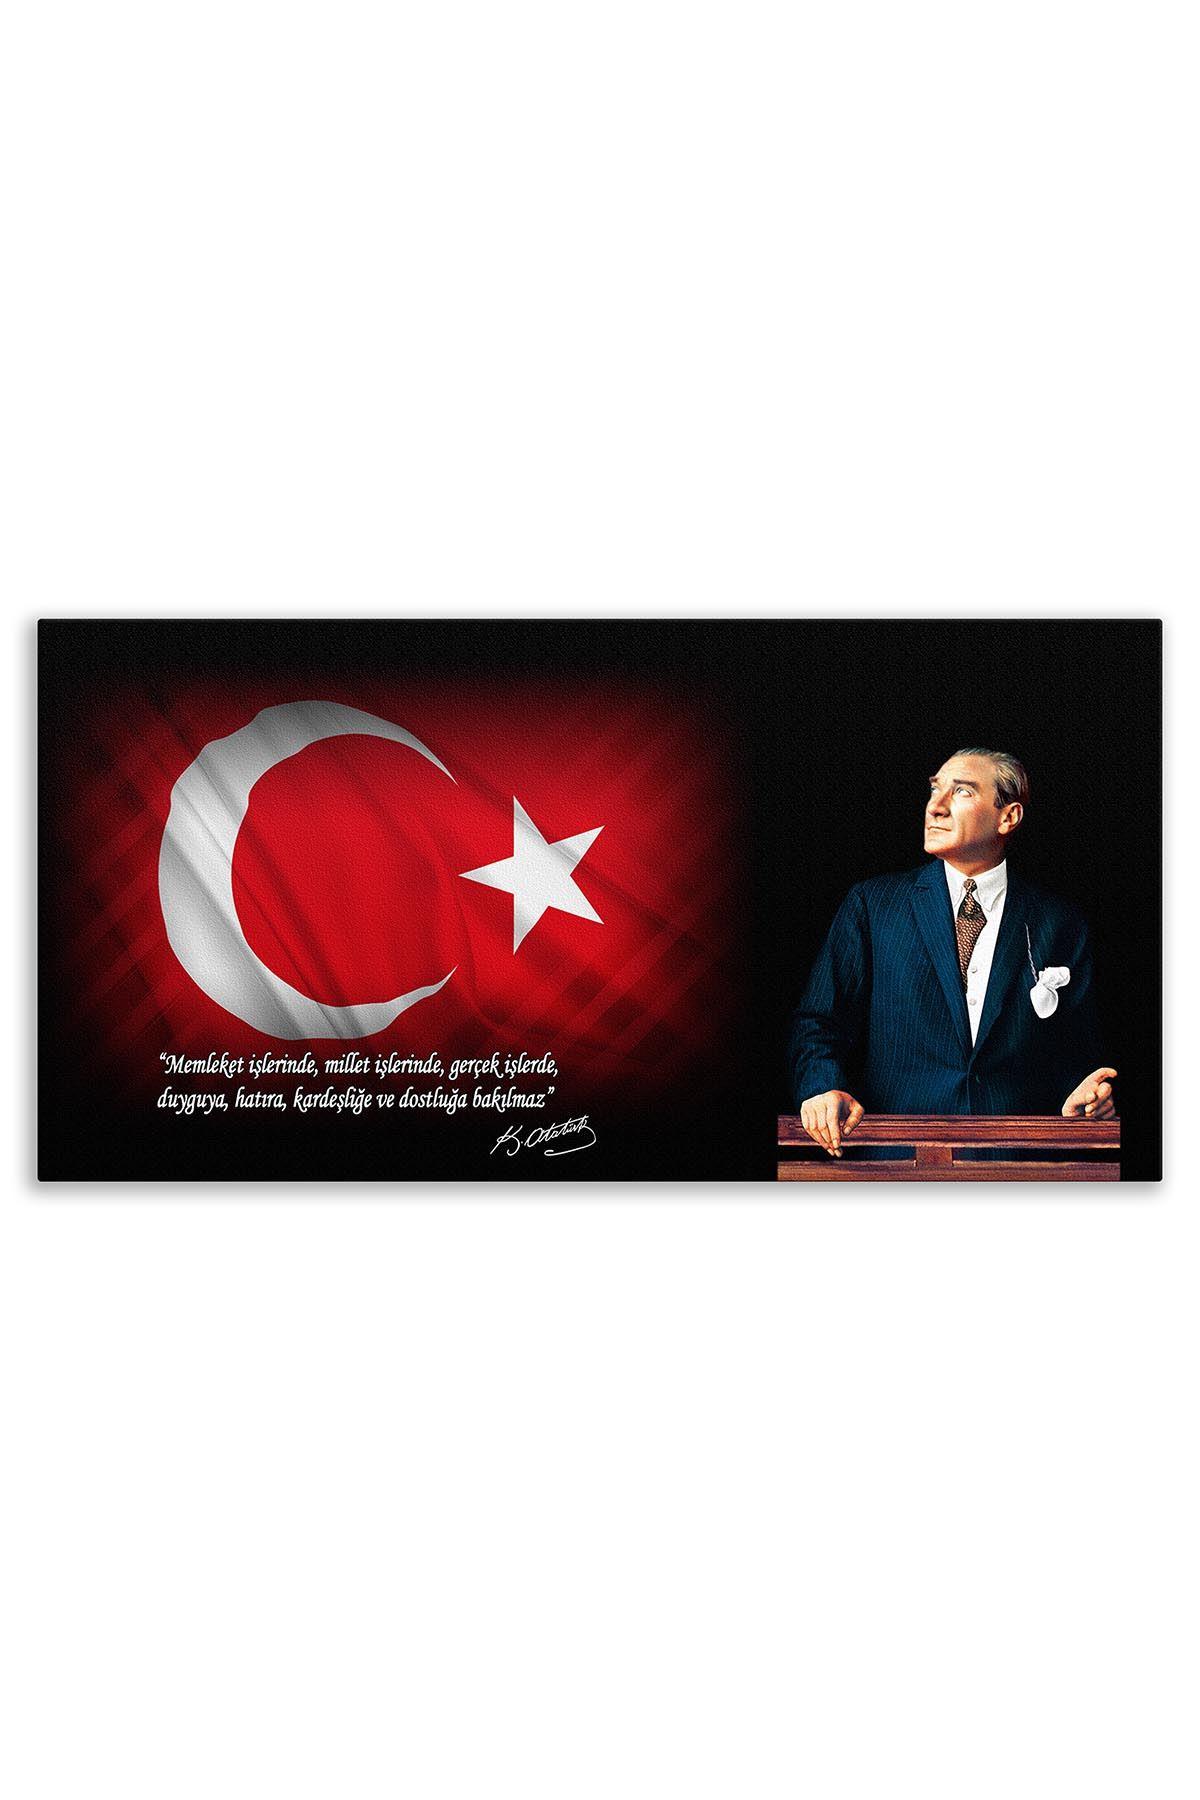 Atatürk In Council Canvas Board | Printed Canvas Board | Customized Canvas Board